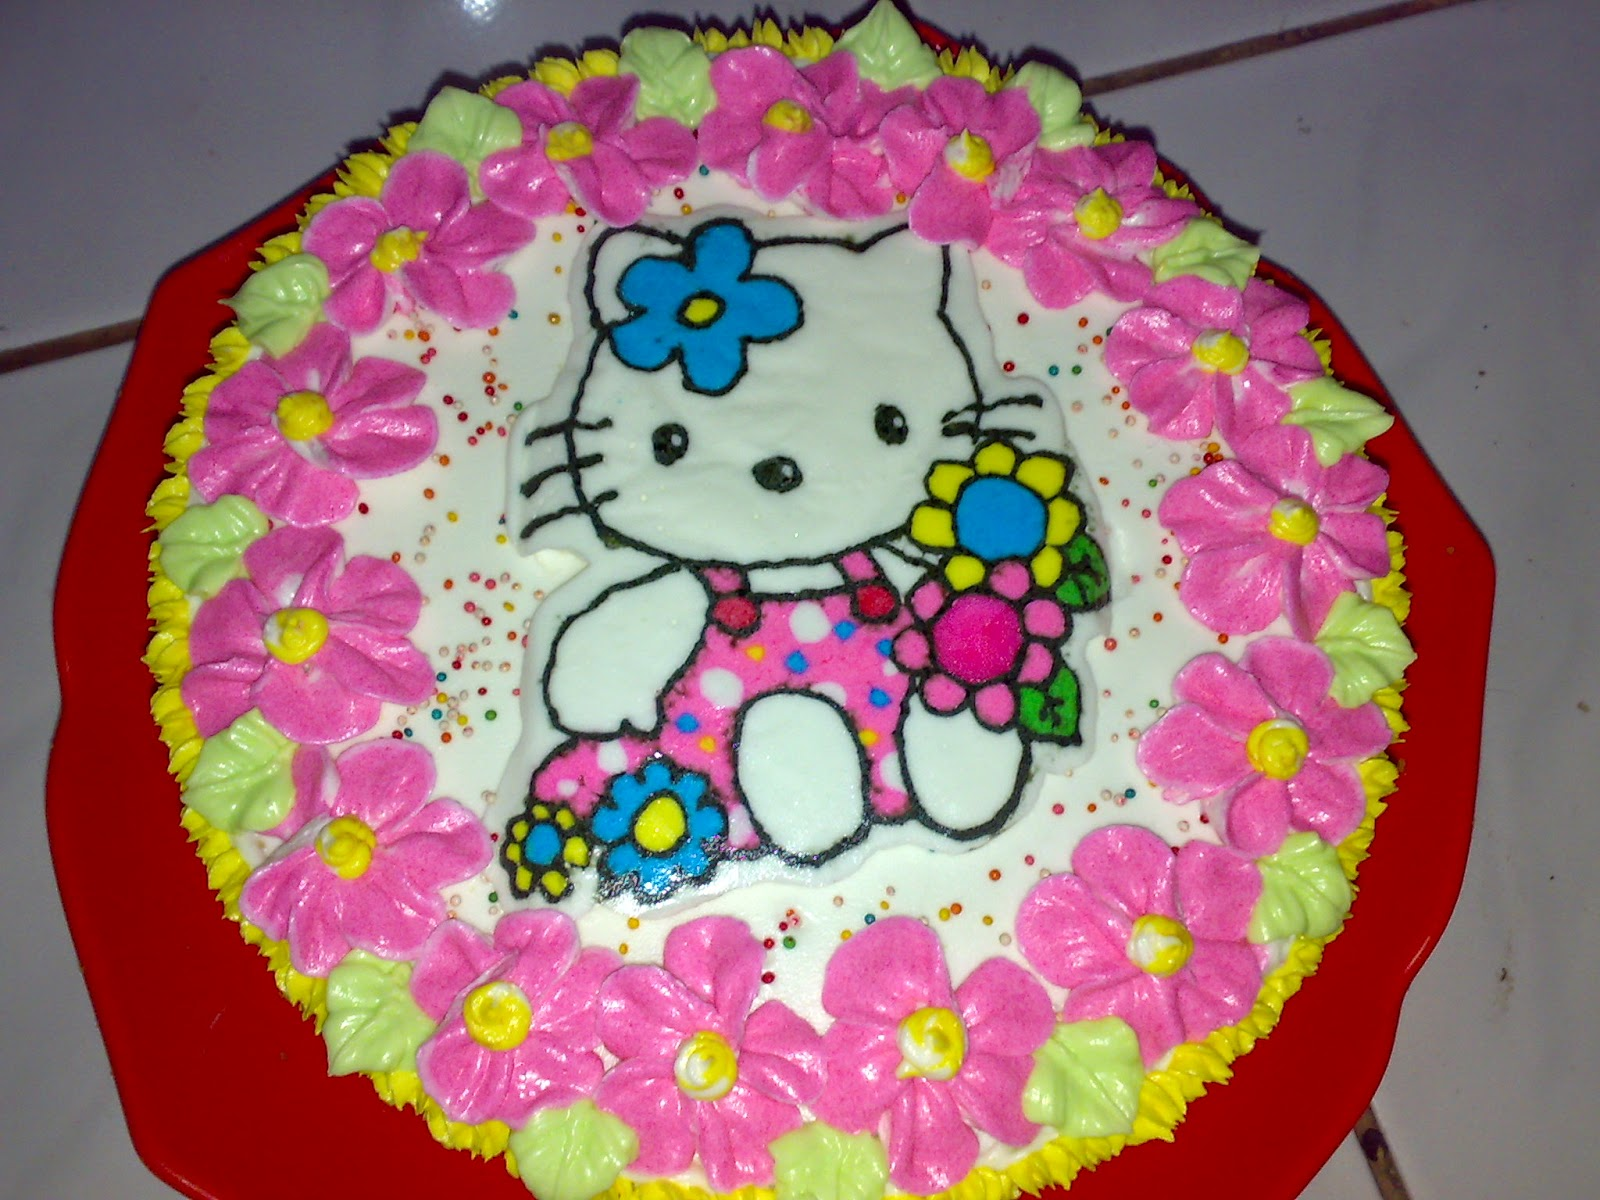 kue ulang tahun tema hello kitty